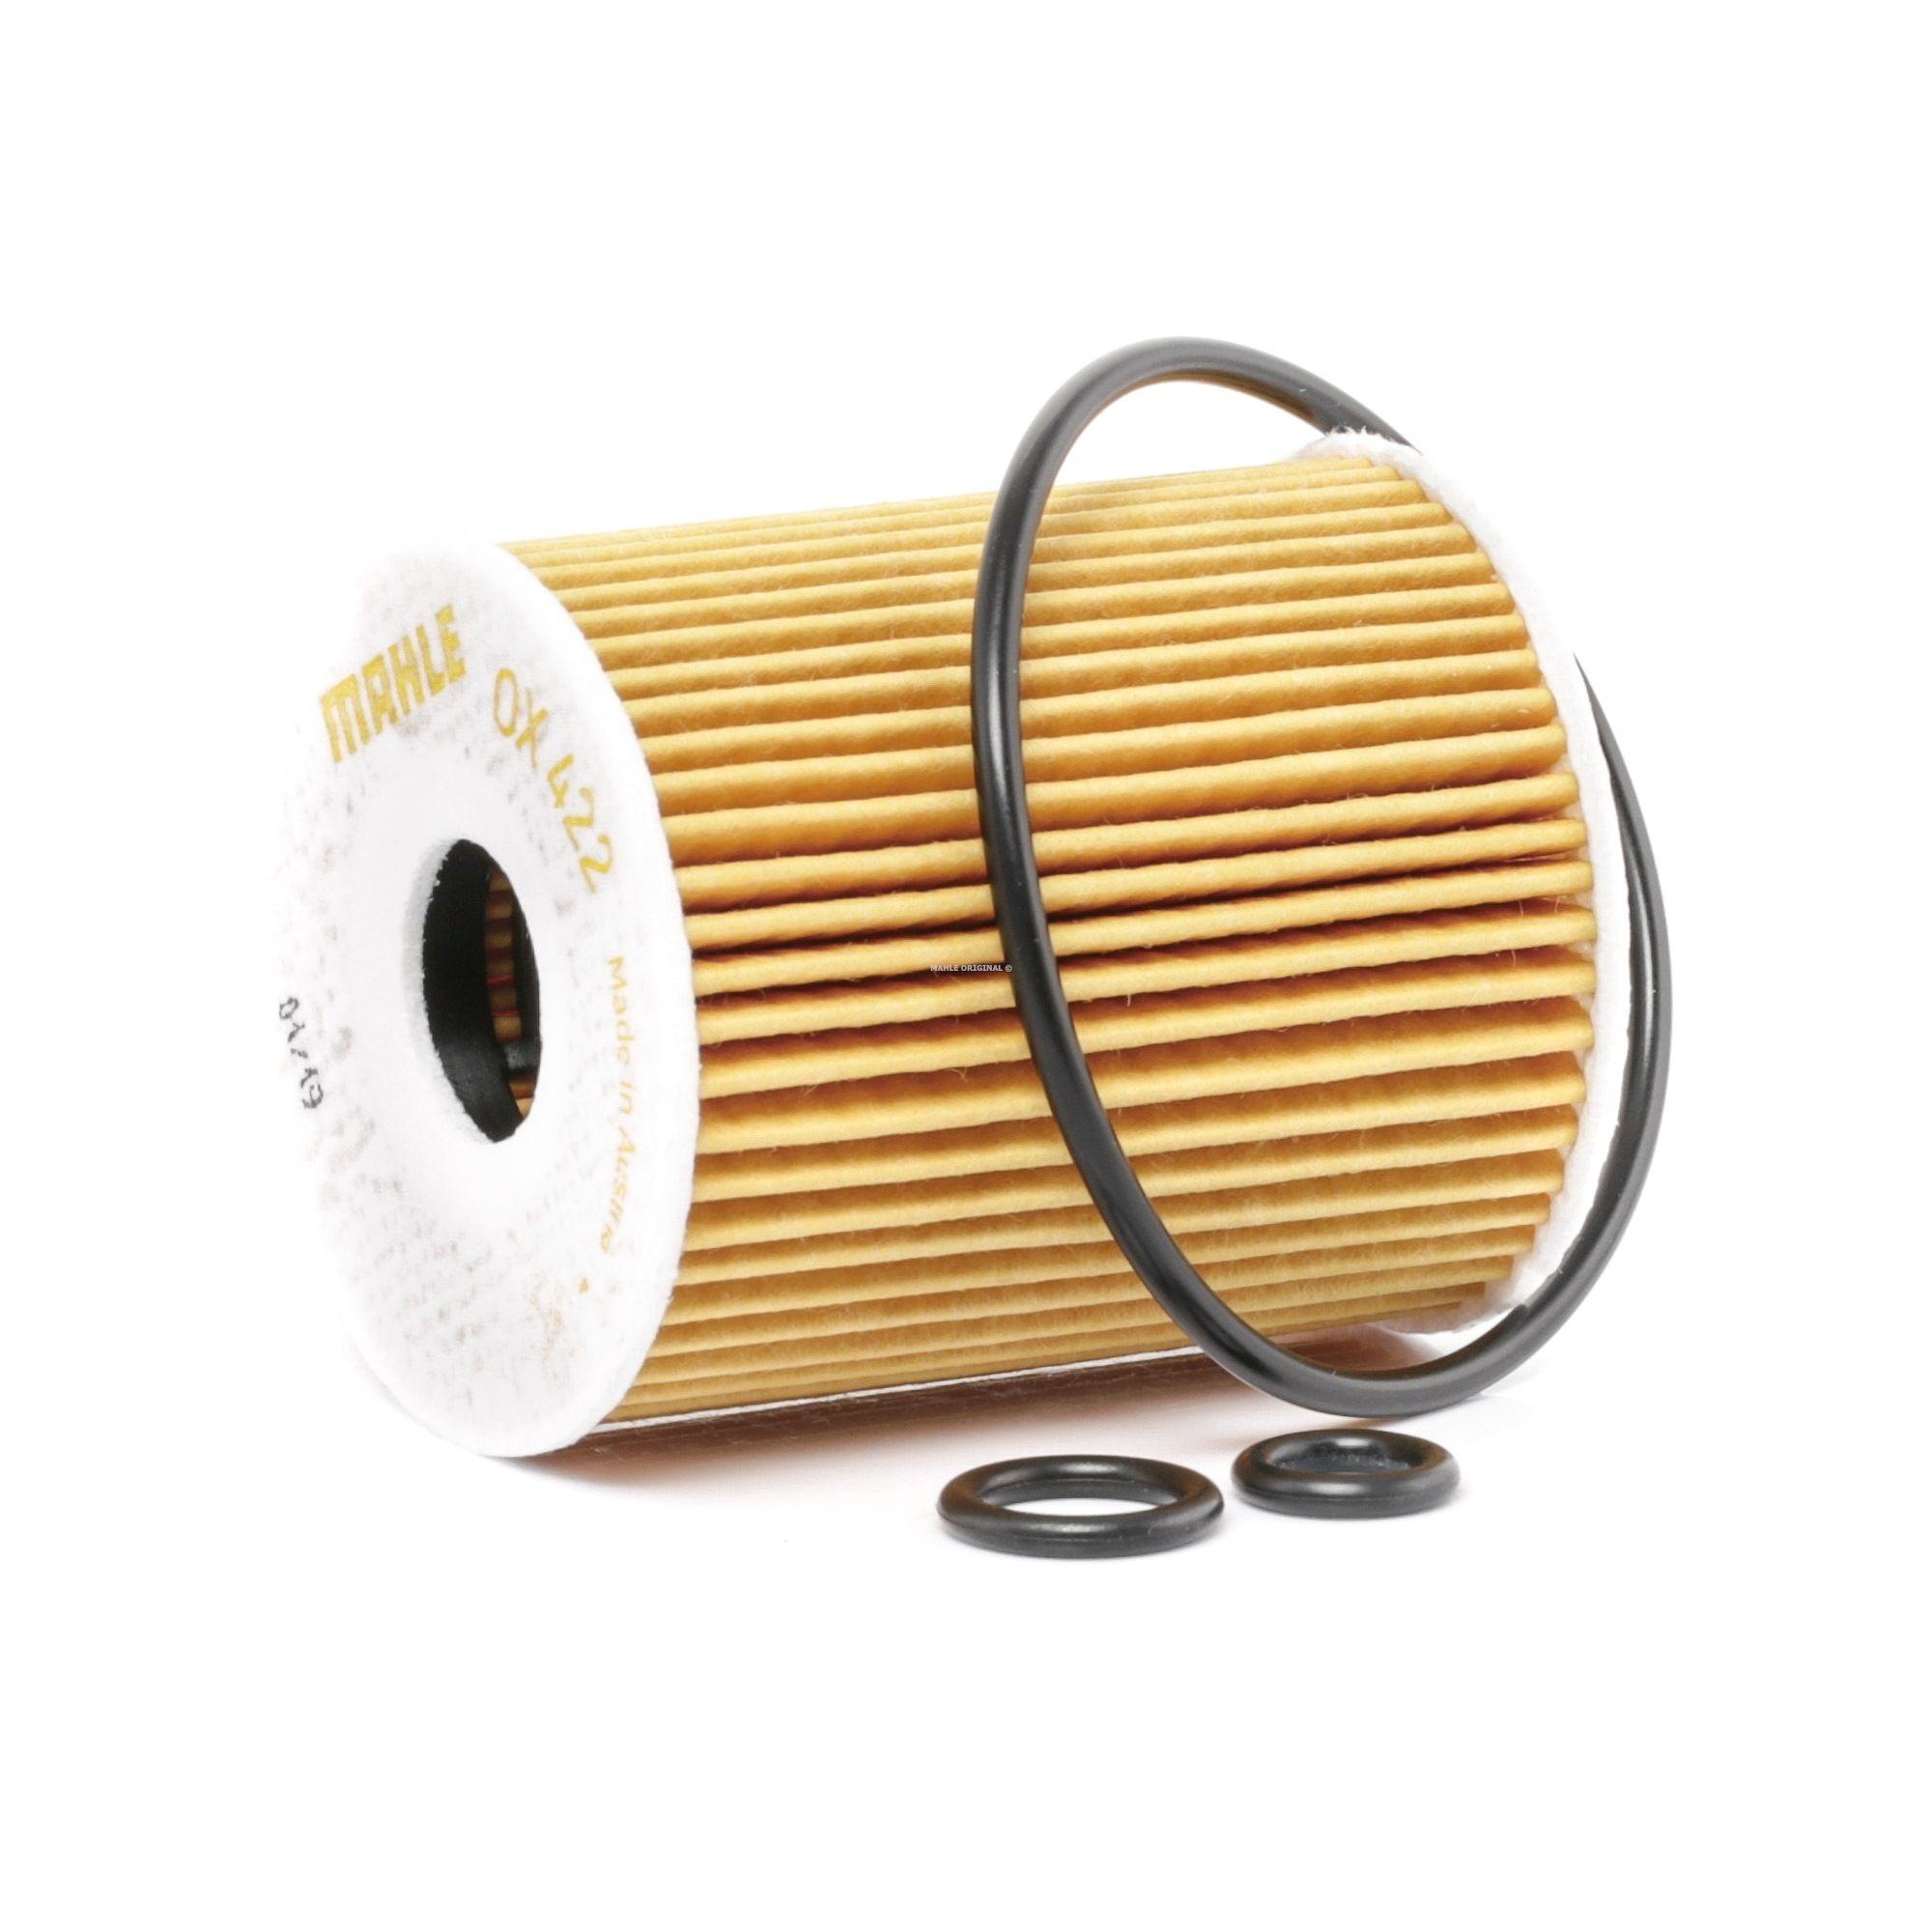 OX422DECO MAHLE ORIGINAL Filtereinsatz Innendurchmesser 2: 22mm, Innendurchmesser 2: 22mm, Ø: 65,0mm, Ø: 65,0mm, Höhe: 76mm Ölfilter OX 422D günstig kaufen